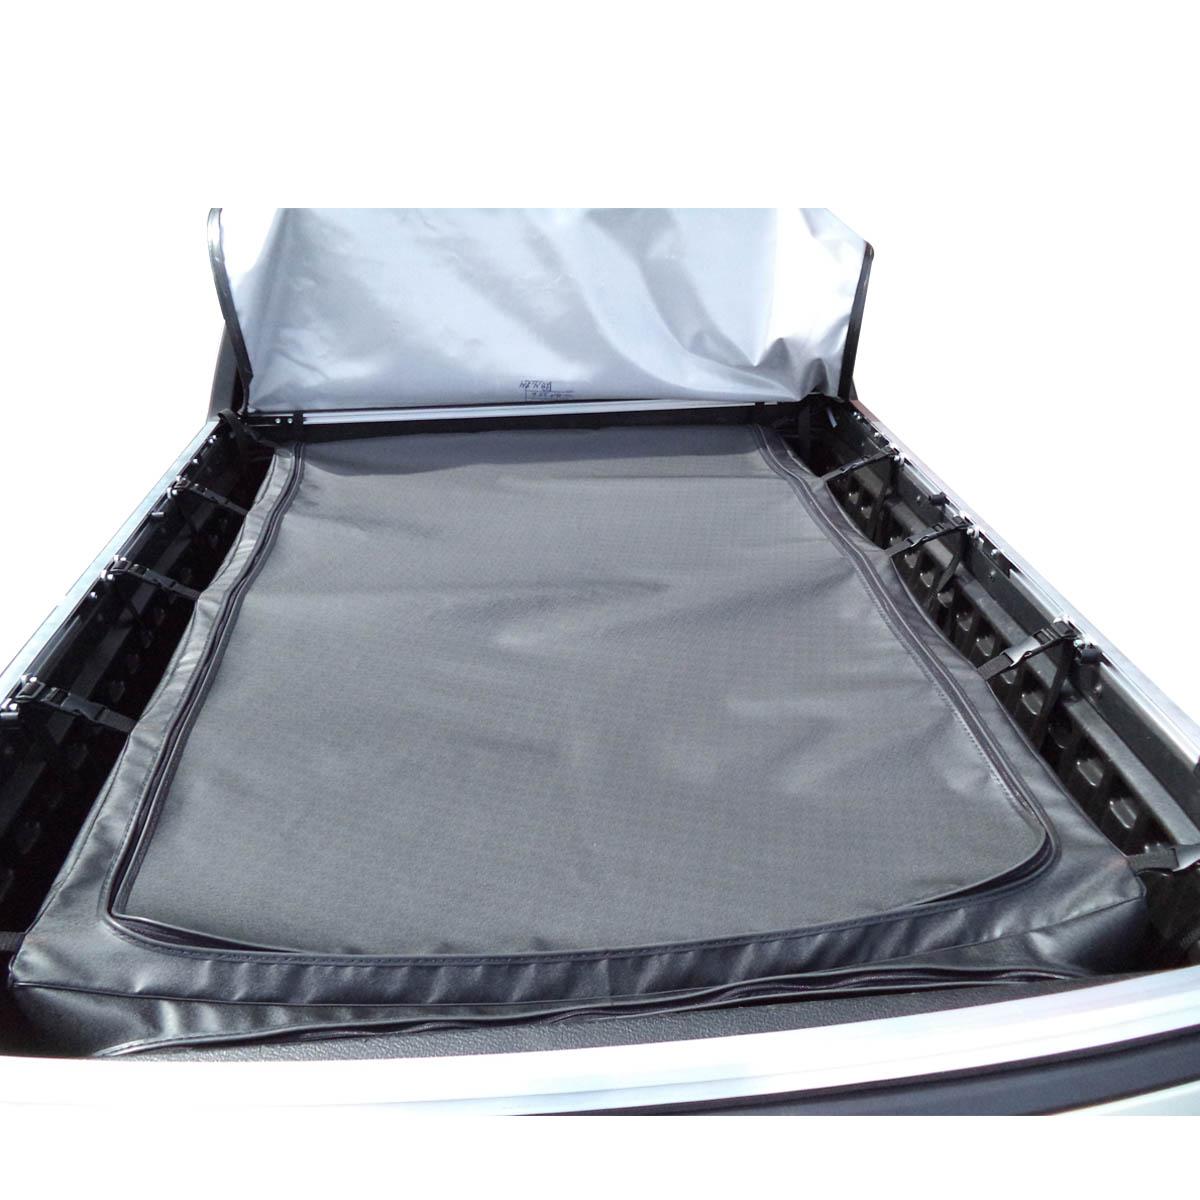 Bolsa ca�amba estendida horizontal F250 1998 a 2011